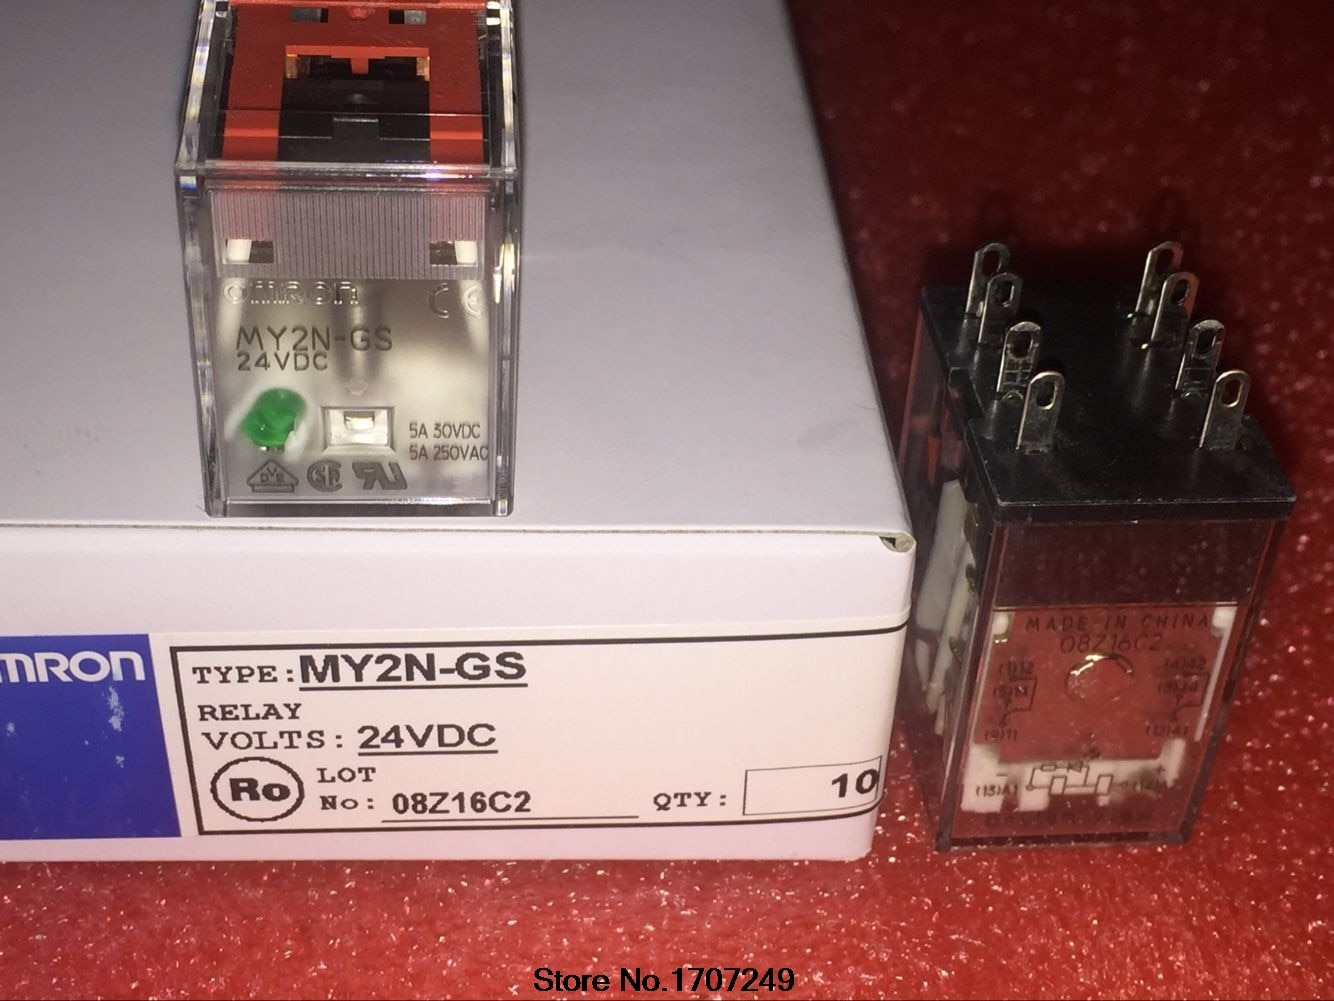 10 teile/los neue original OMRON relais MY2N-GS-DC24V MY2N-GS-24VDC 5A 8PIN Ersetzen das alte modell MY2N-J-DC24V MY2N-J-24VDC